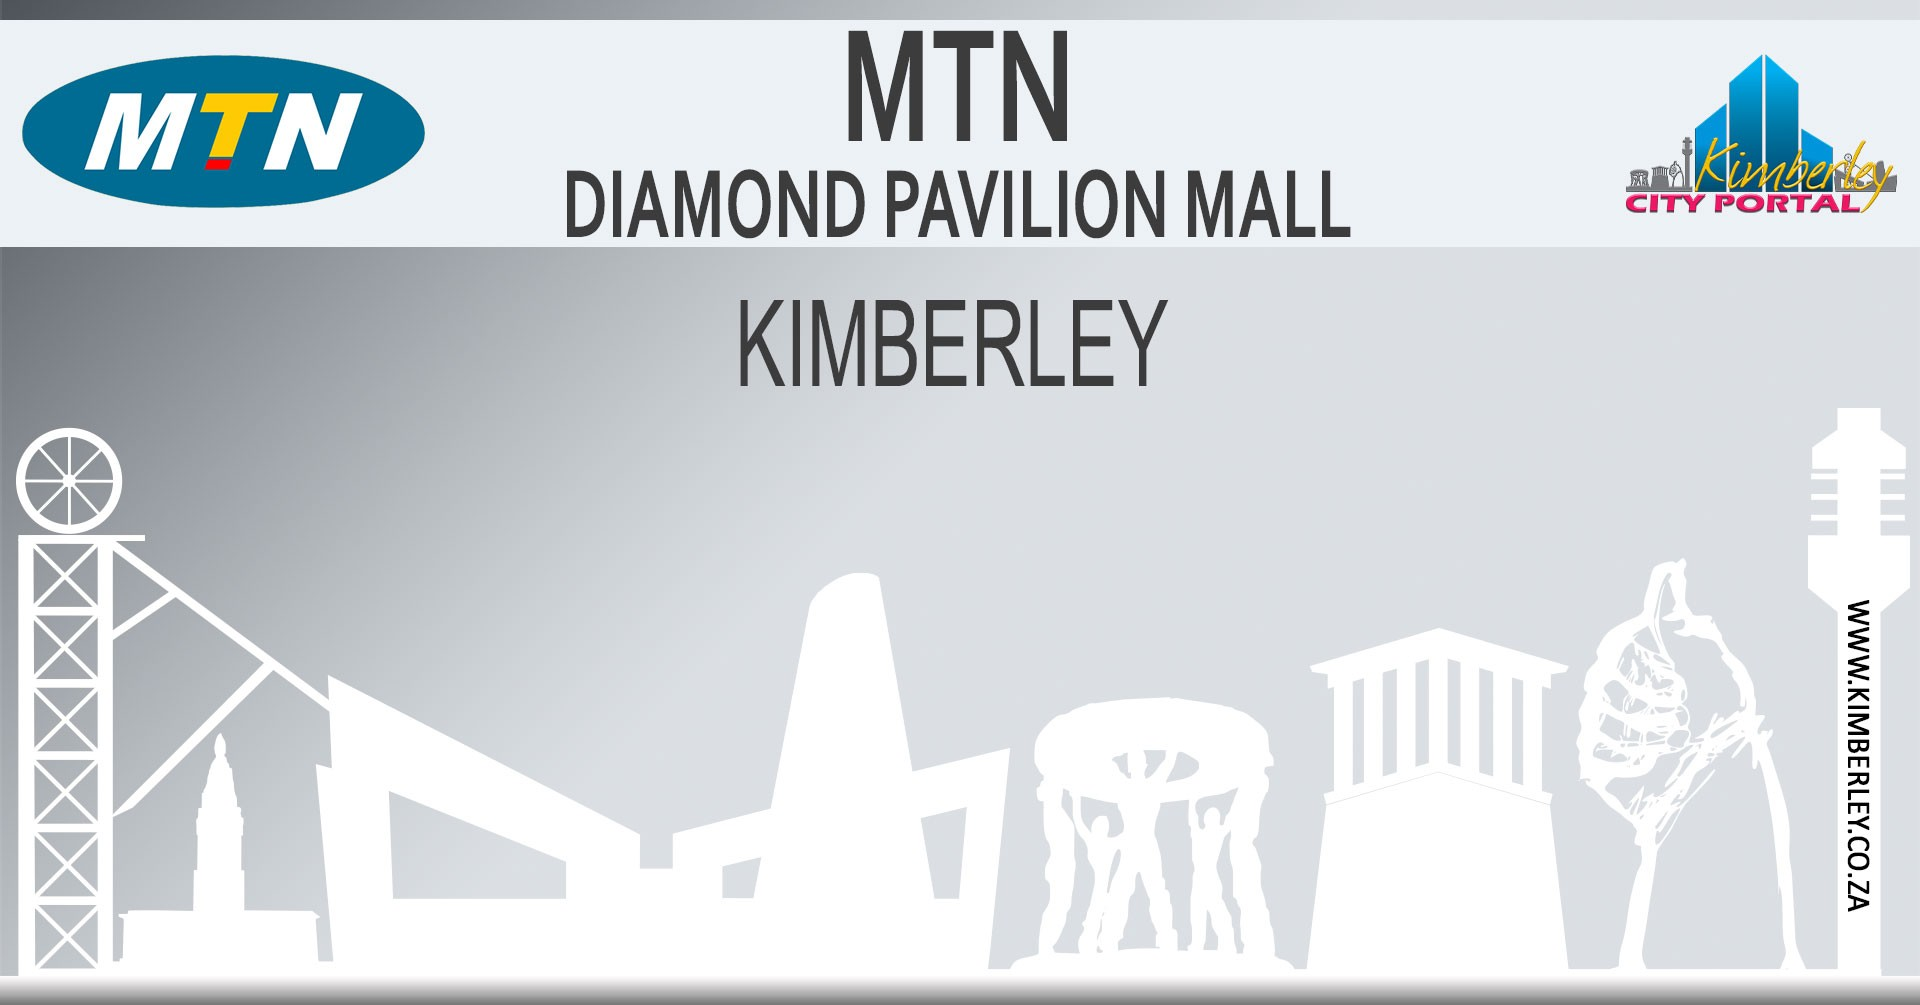 MTN Diamond Pavilion • Kimberley • CITY PORTAL